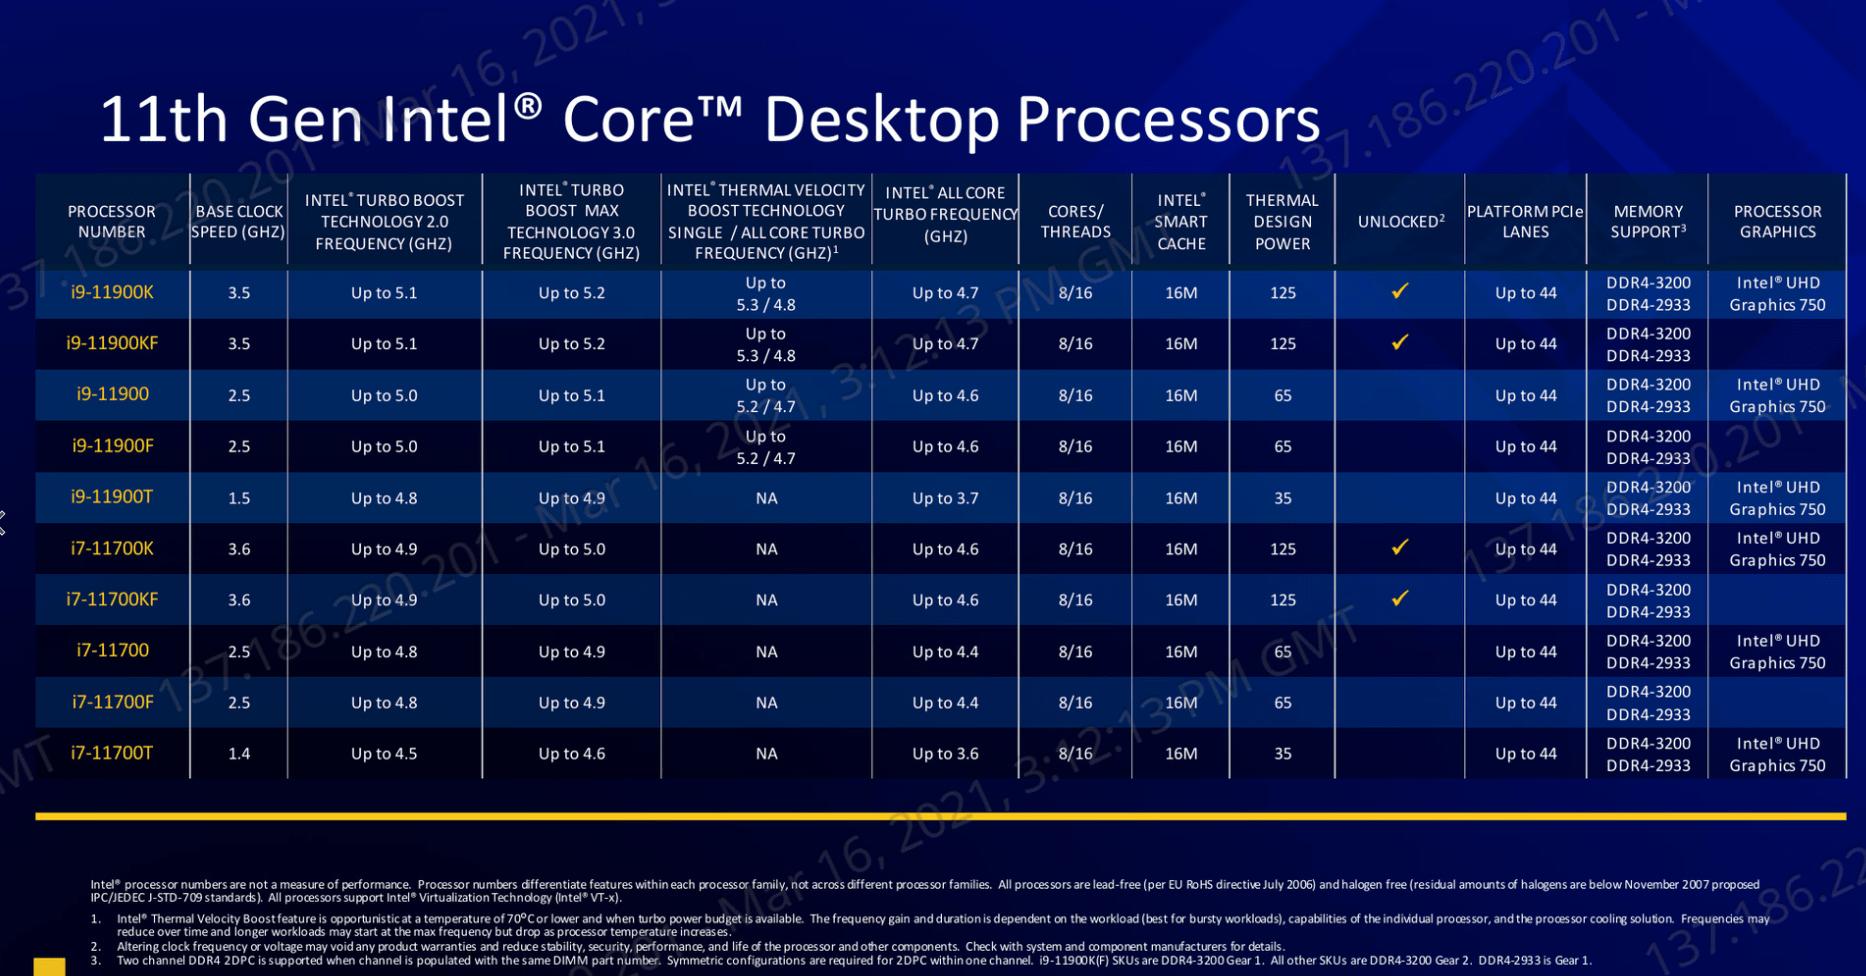 Intels Rocket Lake SKU 11900K - 11th Gen Intel Rocket Lake-S